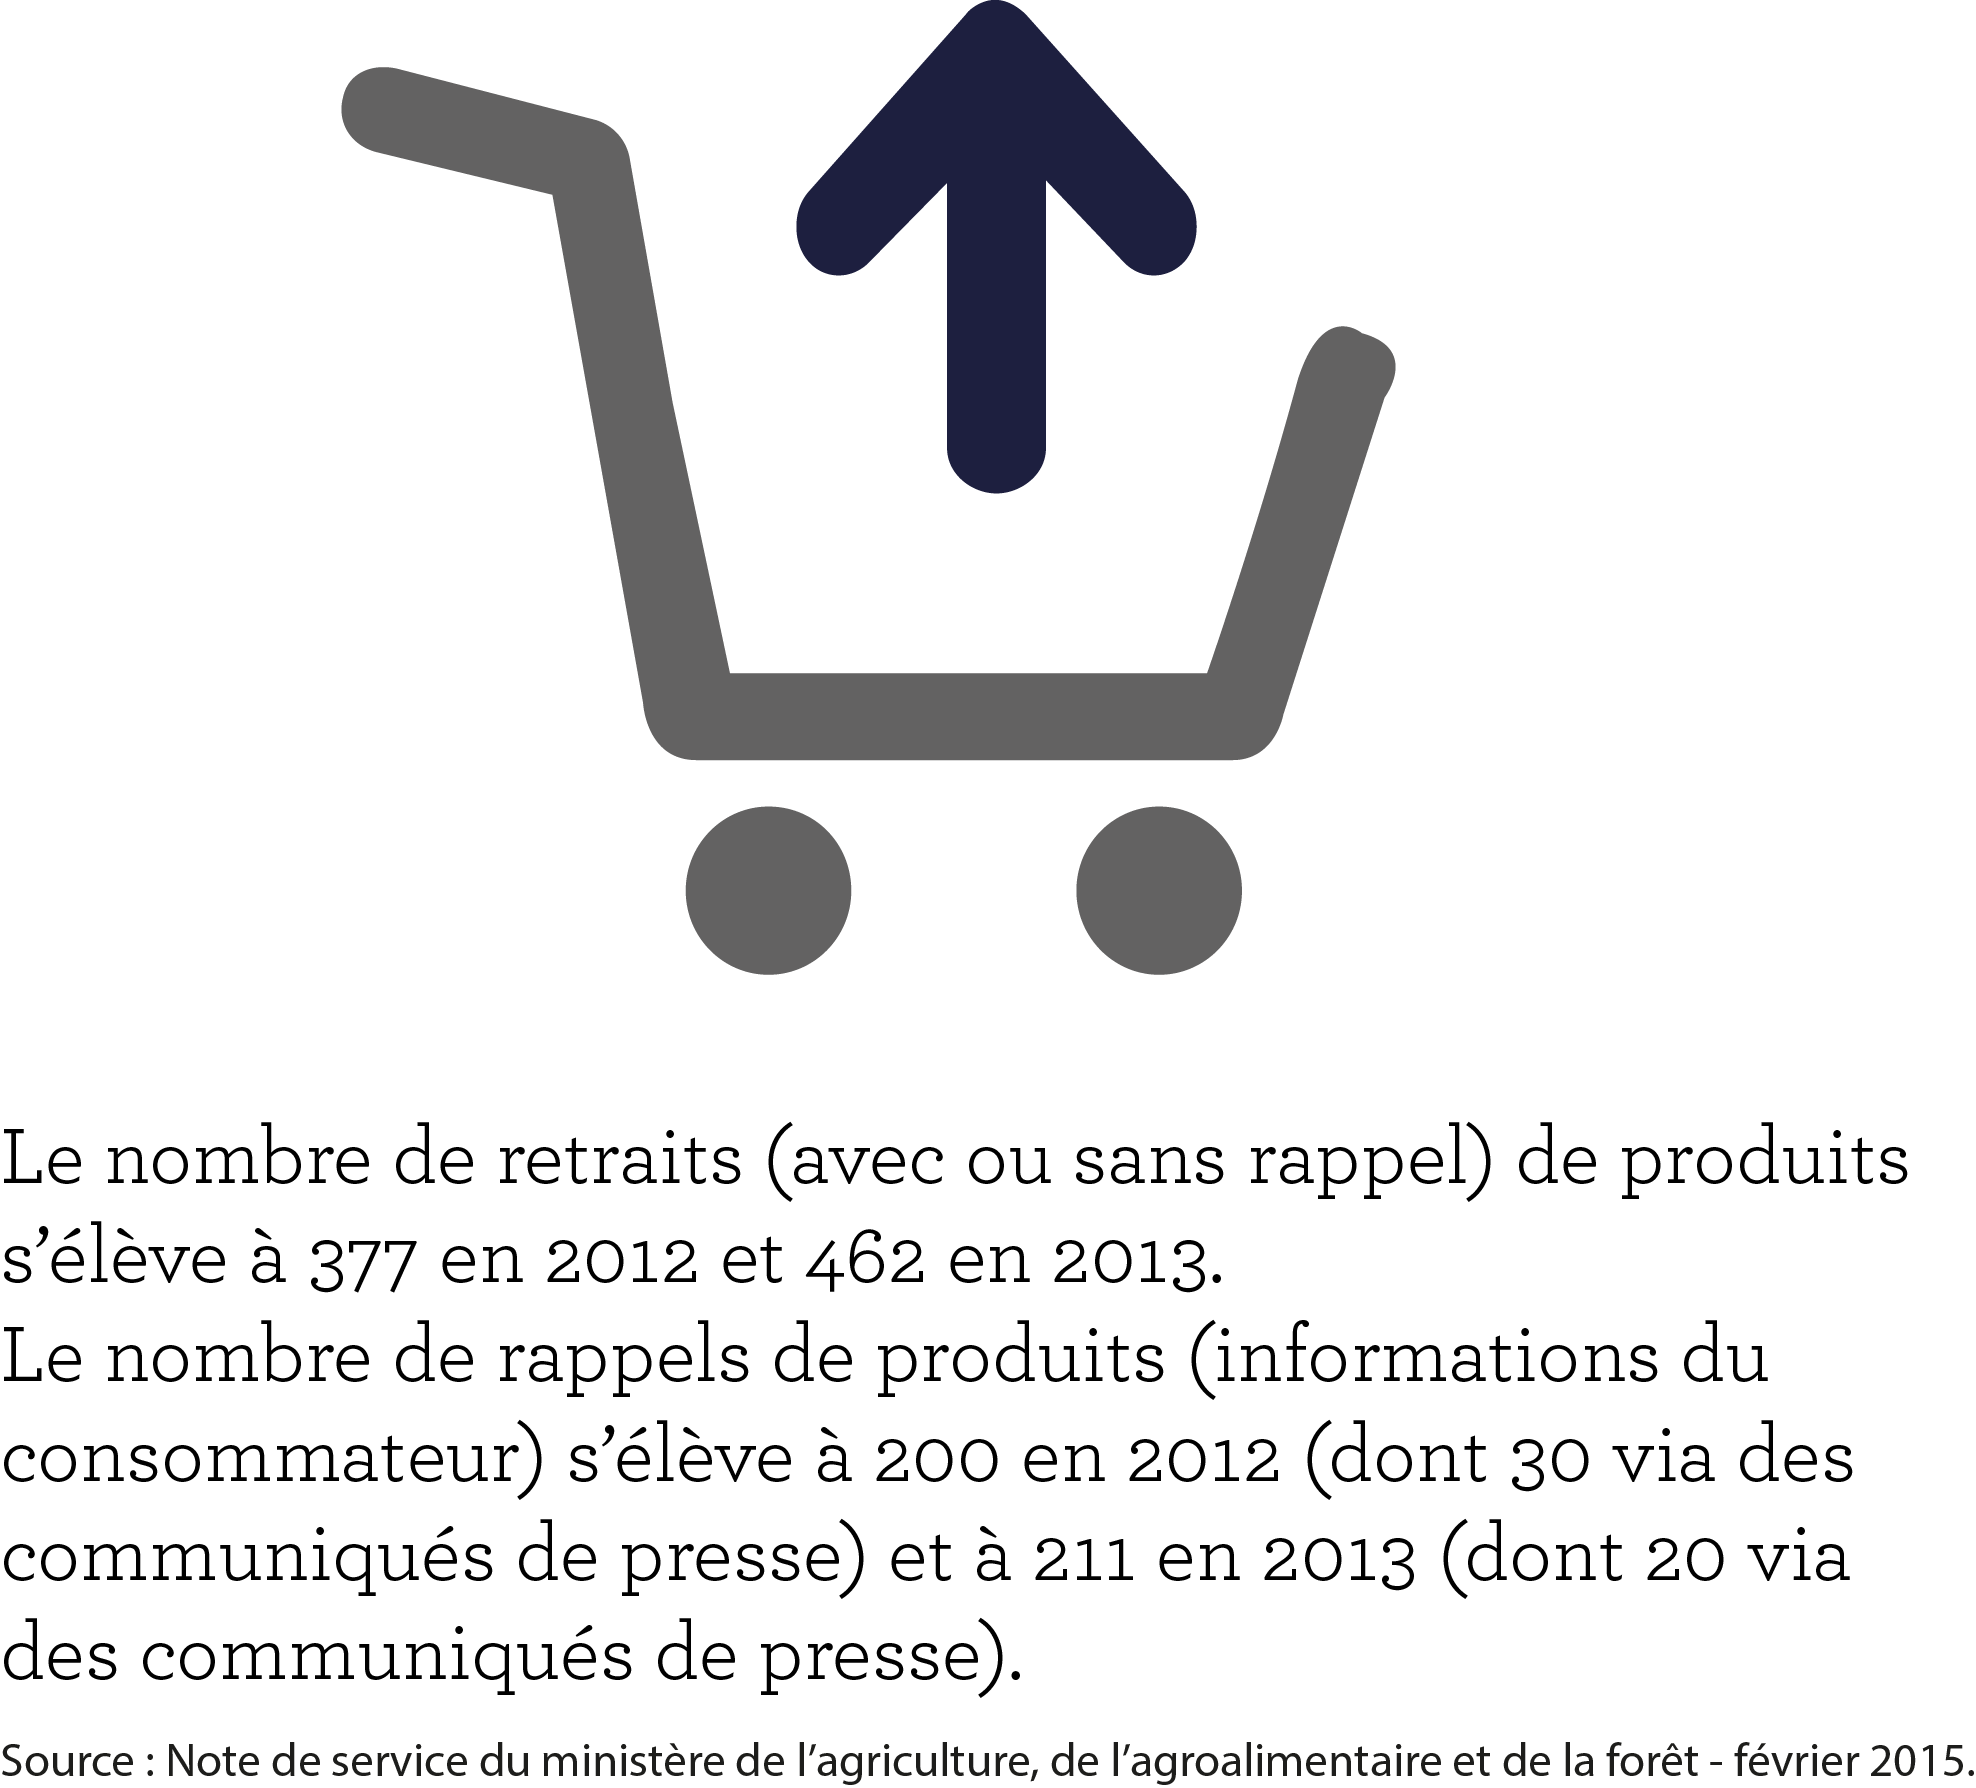 retraits et rappels de produits